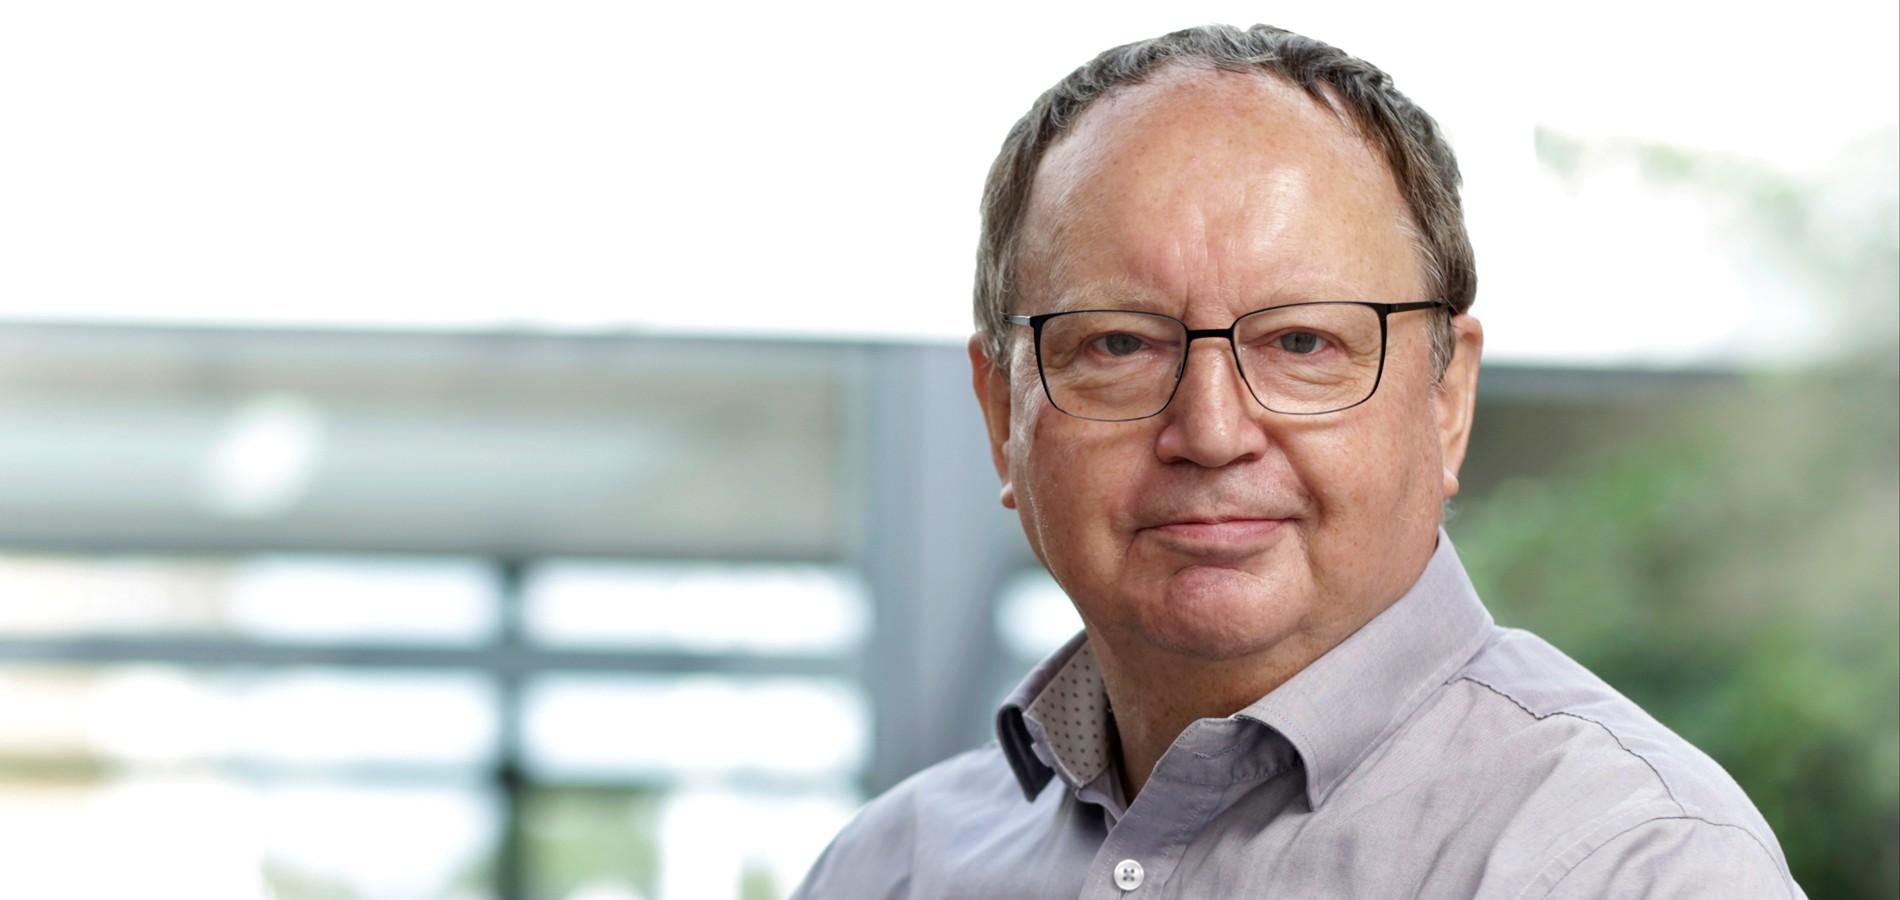 DAMM Cellular Systems Owner, Hans Damm, Turns 70